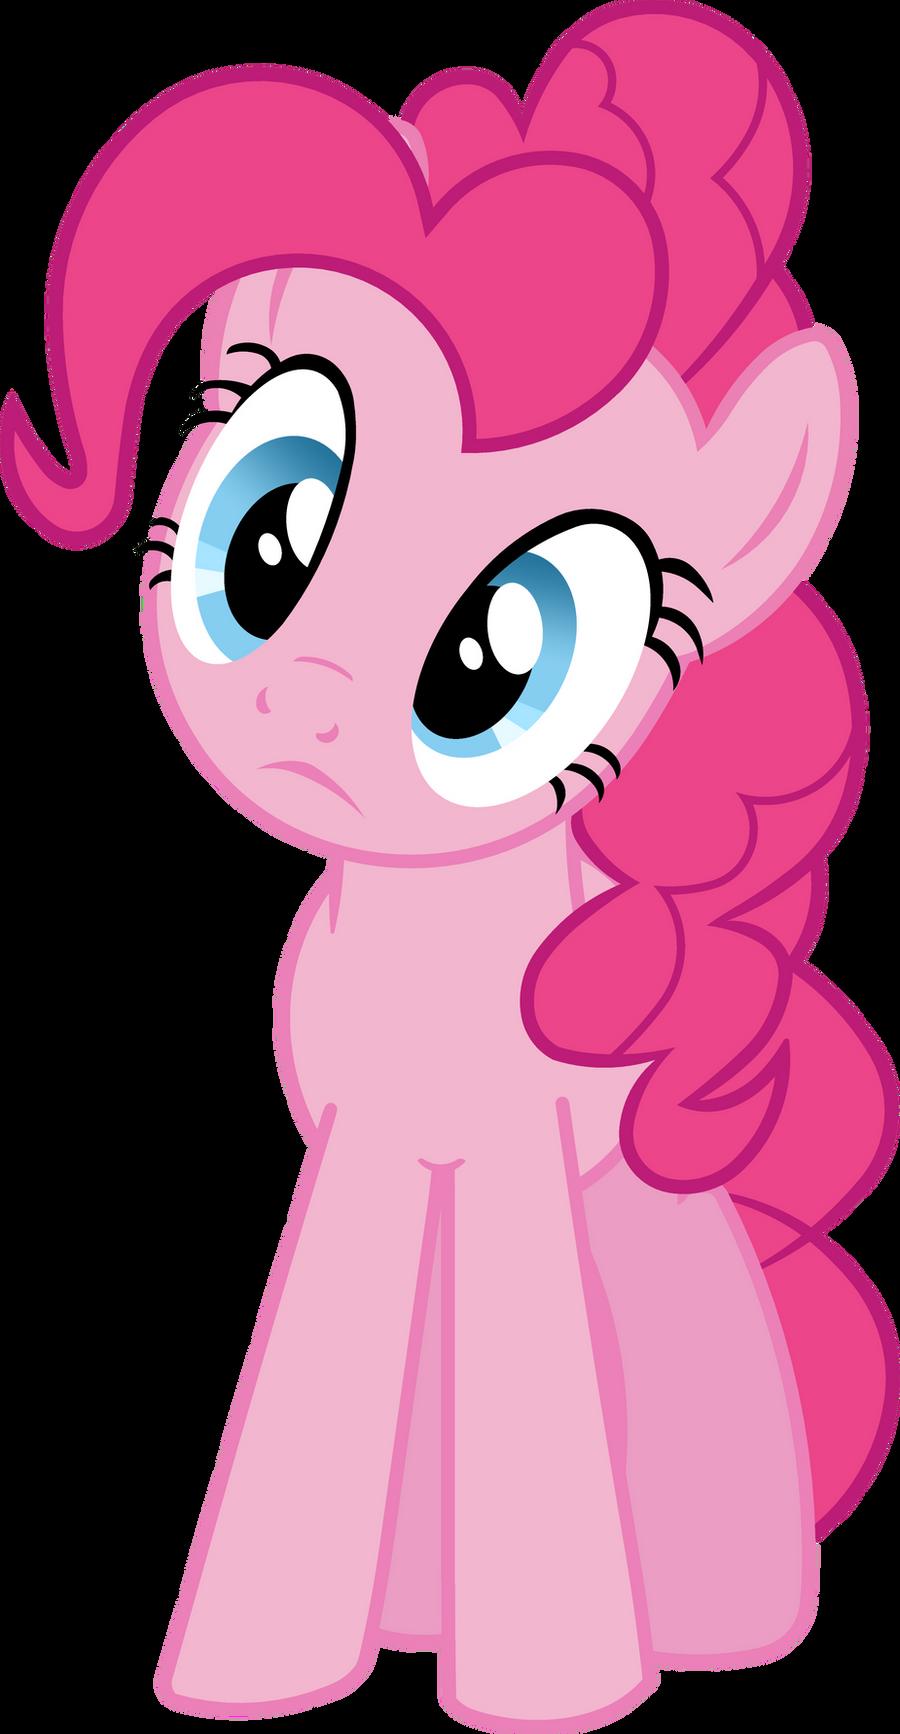 Pinkie pie head tilted perplexity by bobthelurker